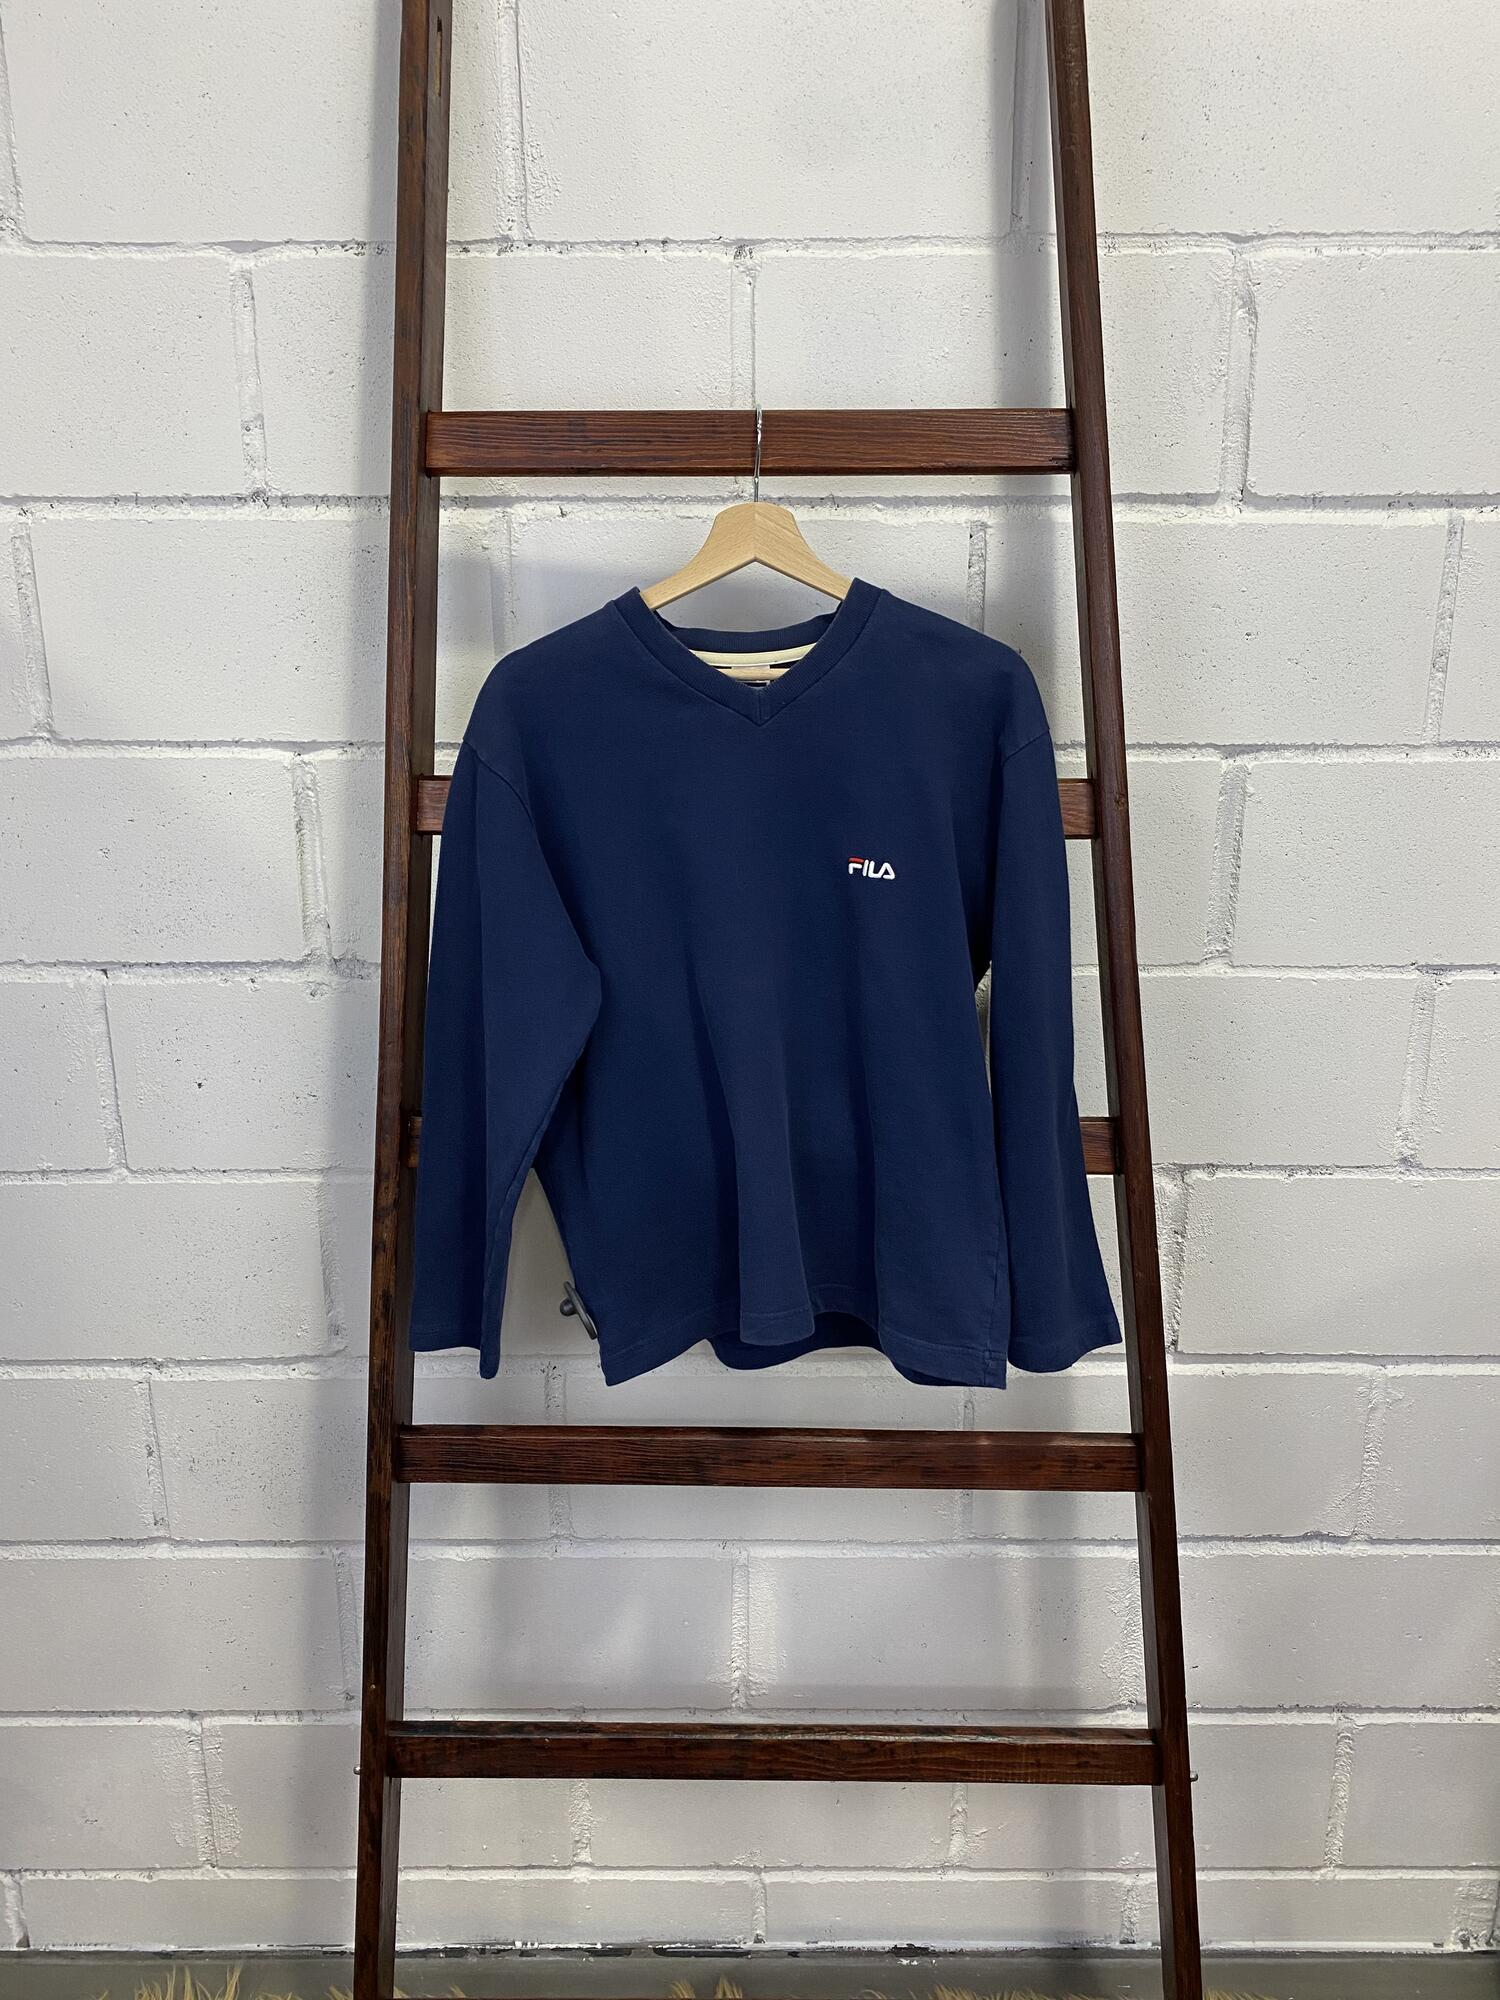 Bluza granatowa FILA - Vintage Store | JestemSlow.pl